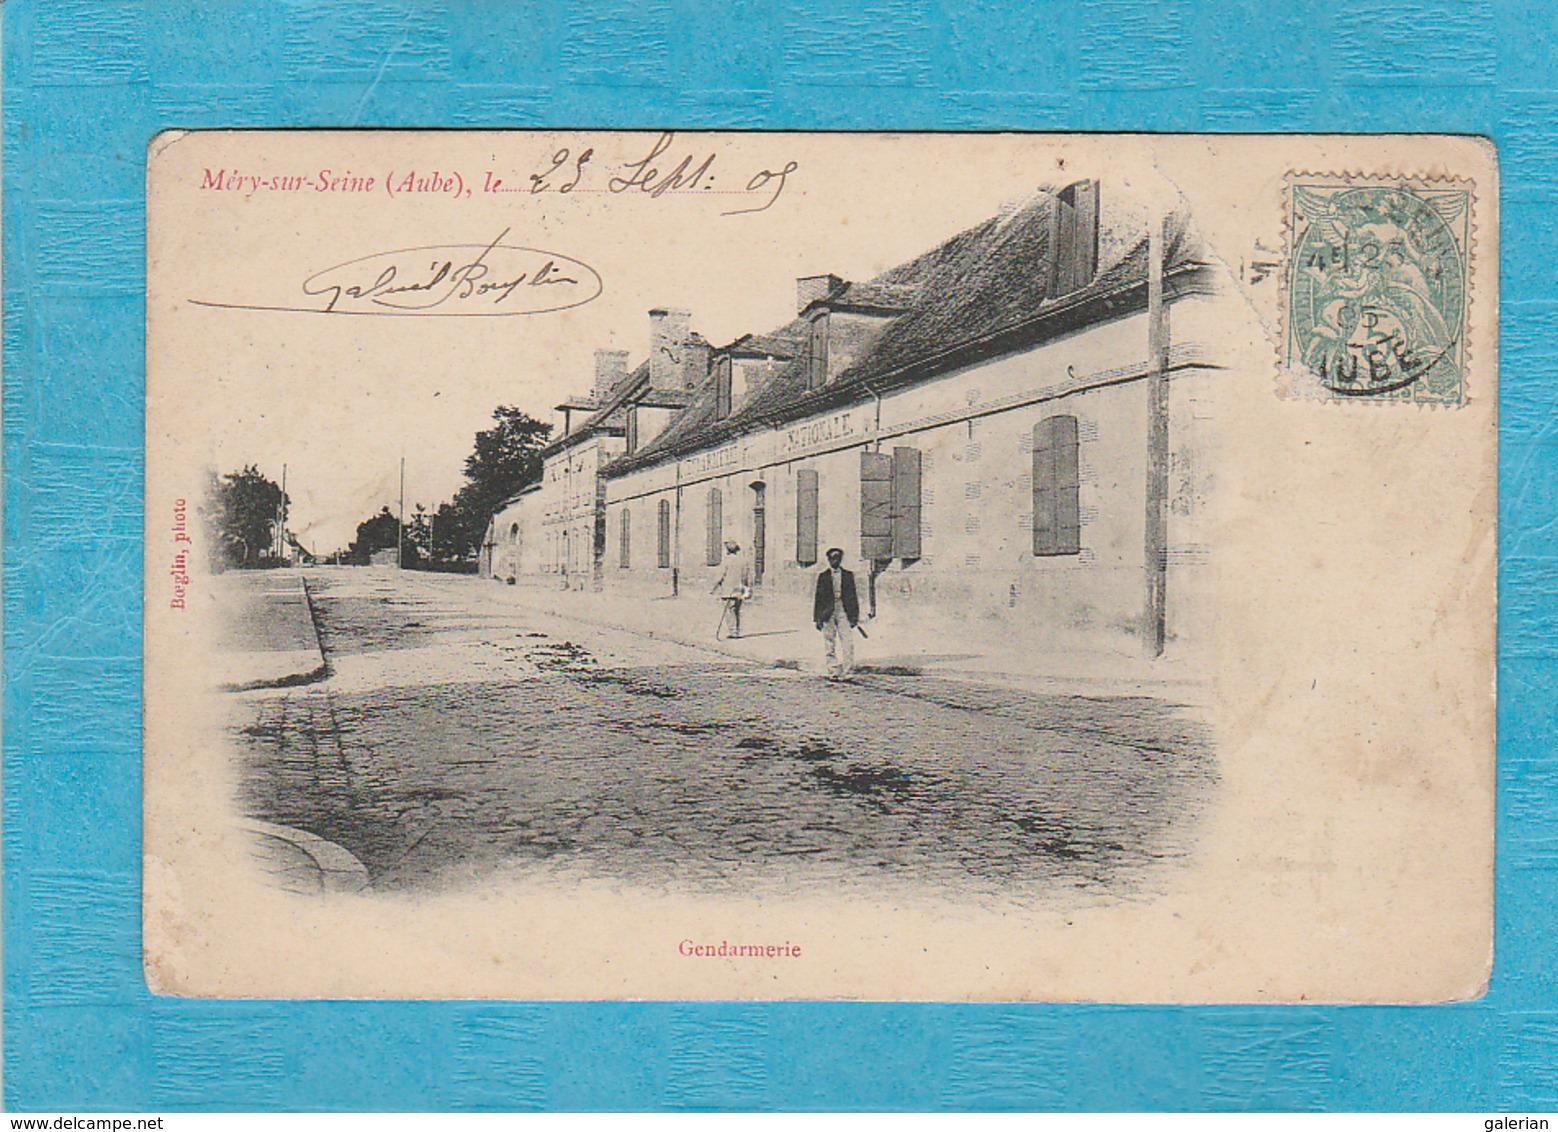 Méry-sur-Seine. - Gendarmerie. - Francia